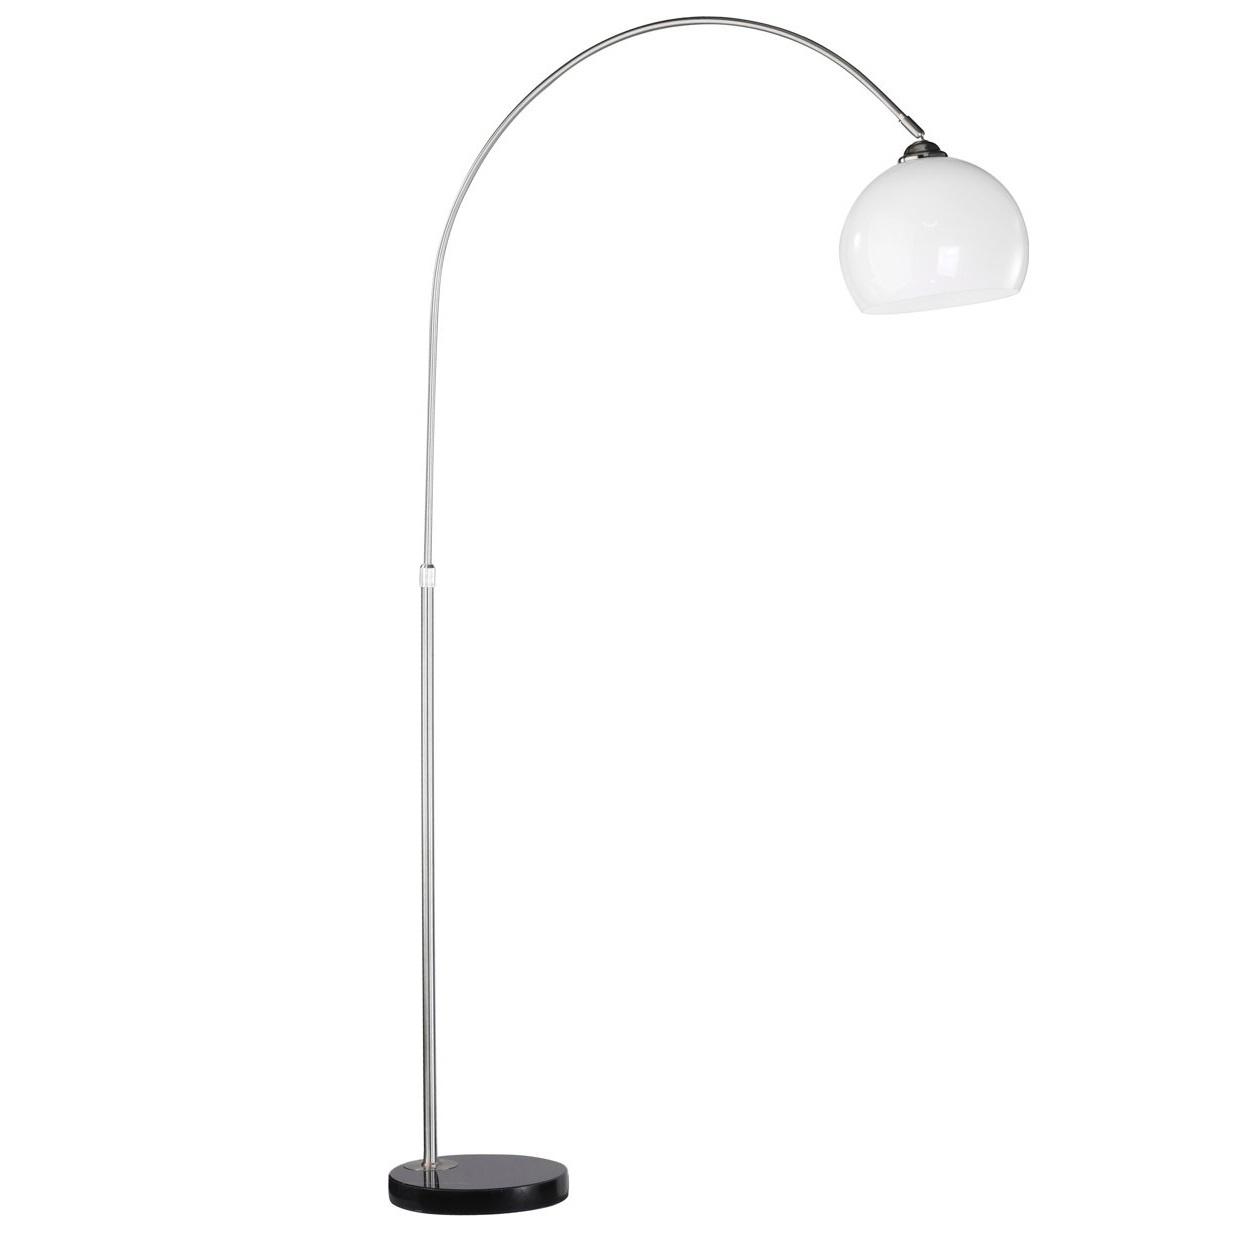 Vloerlamp Booglamp Klein 25cm Bol